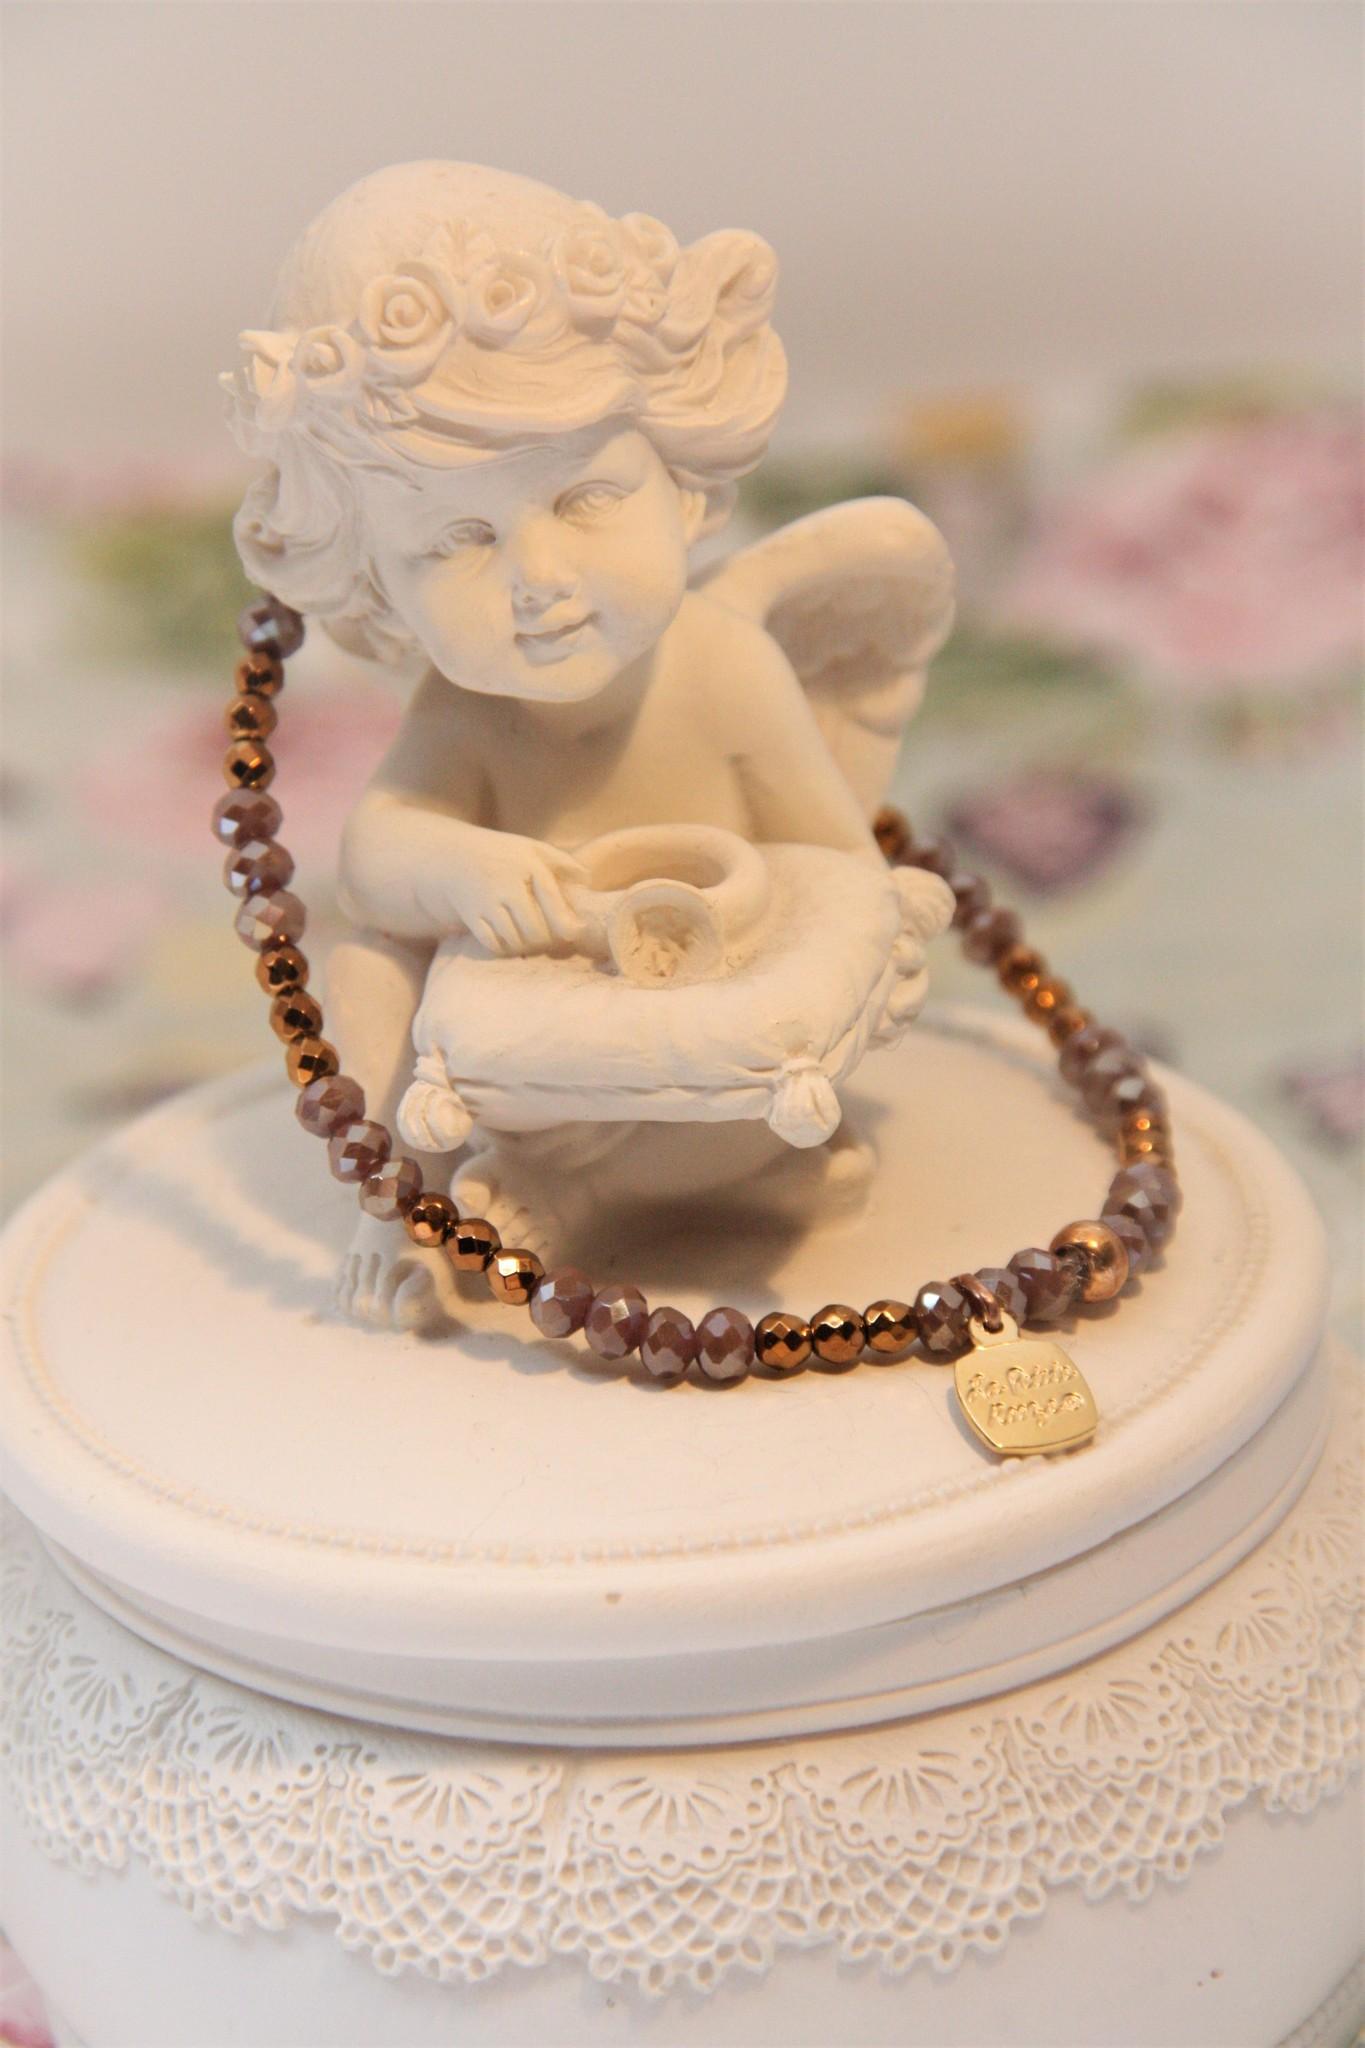 La Petite Rooze Handgemaakte fantasie armband op elastiek